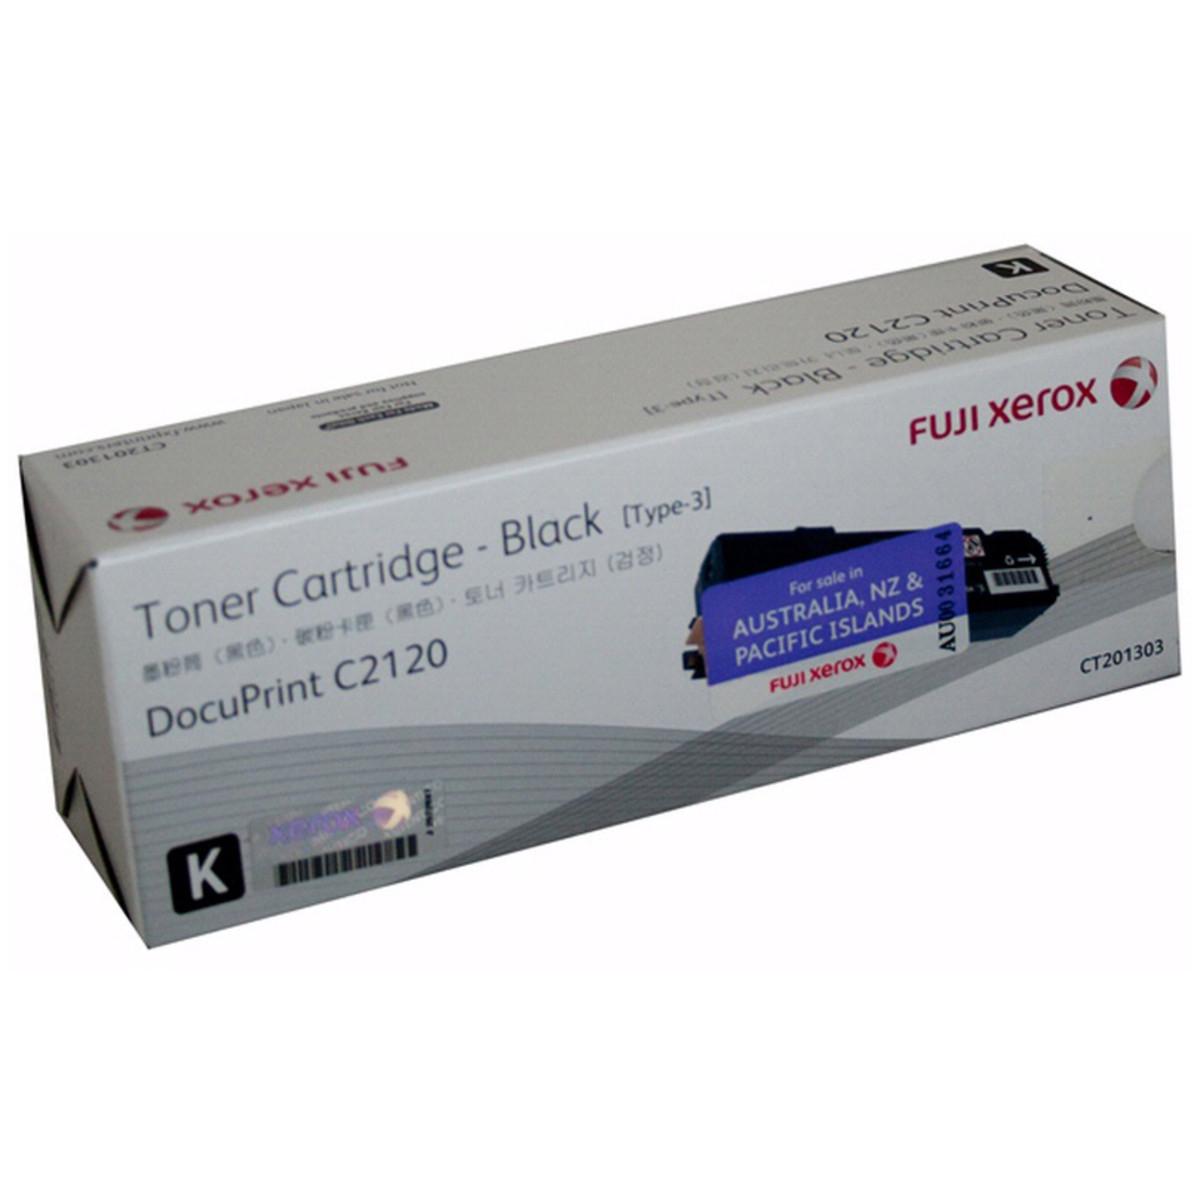 Xerox CT201303 Black Toner Cartridge